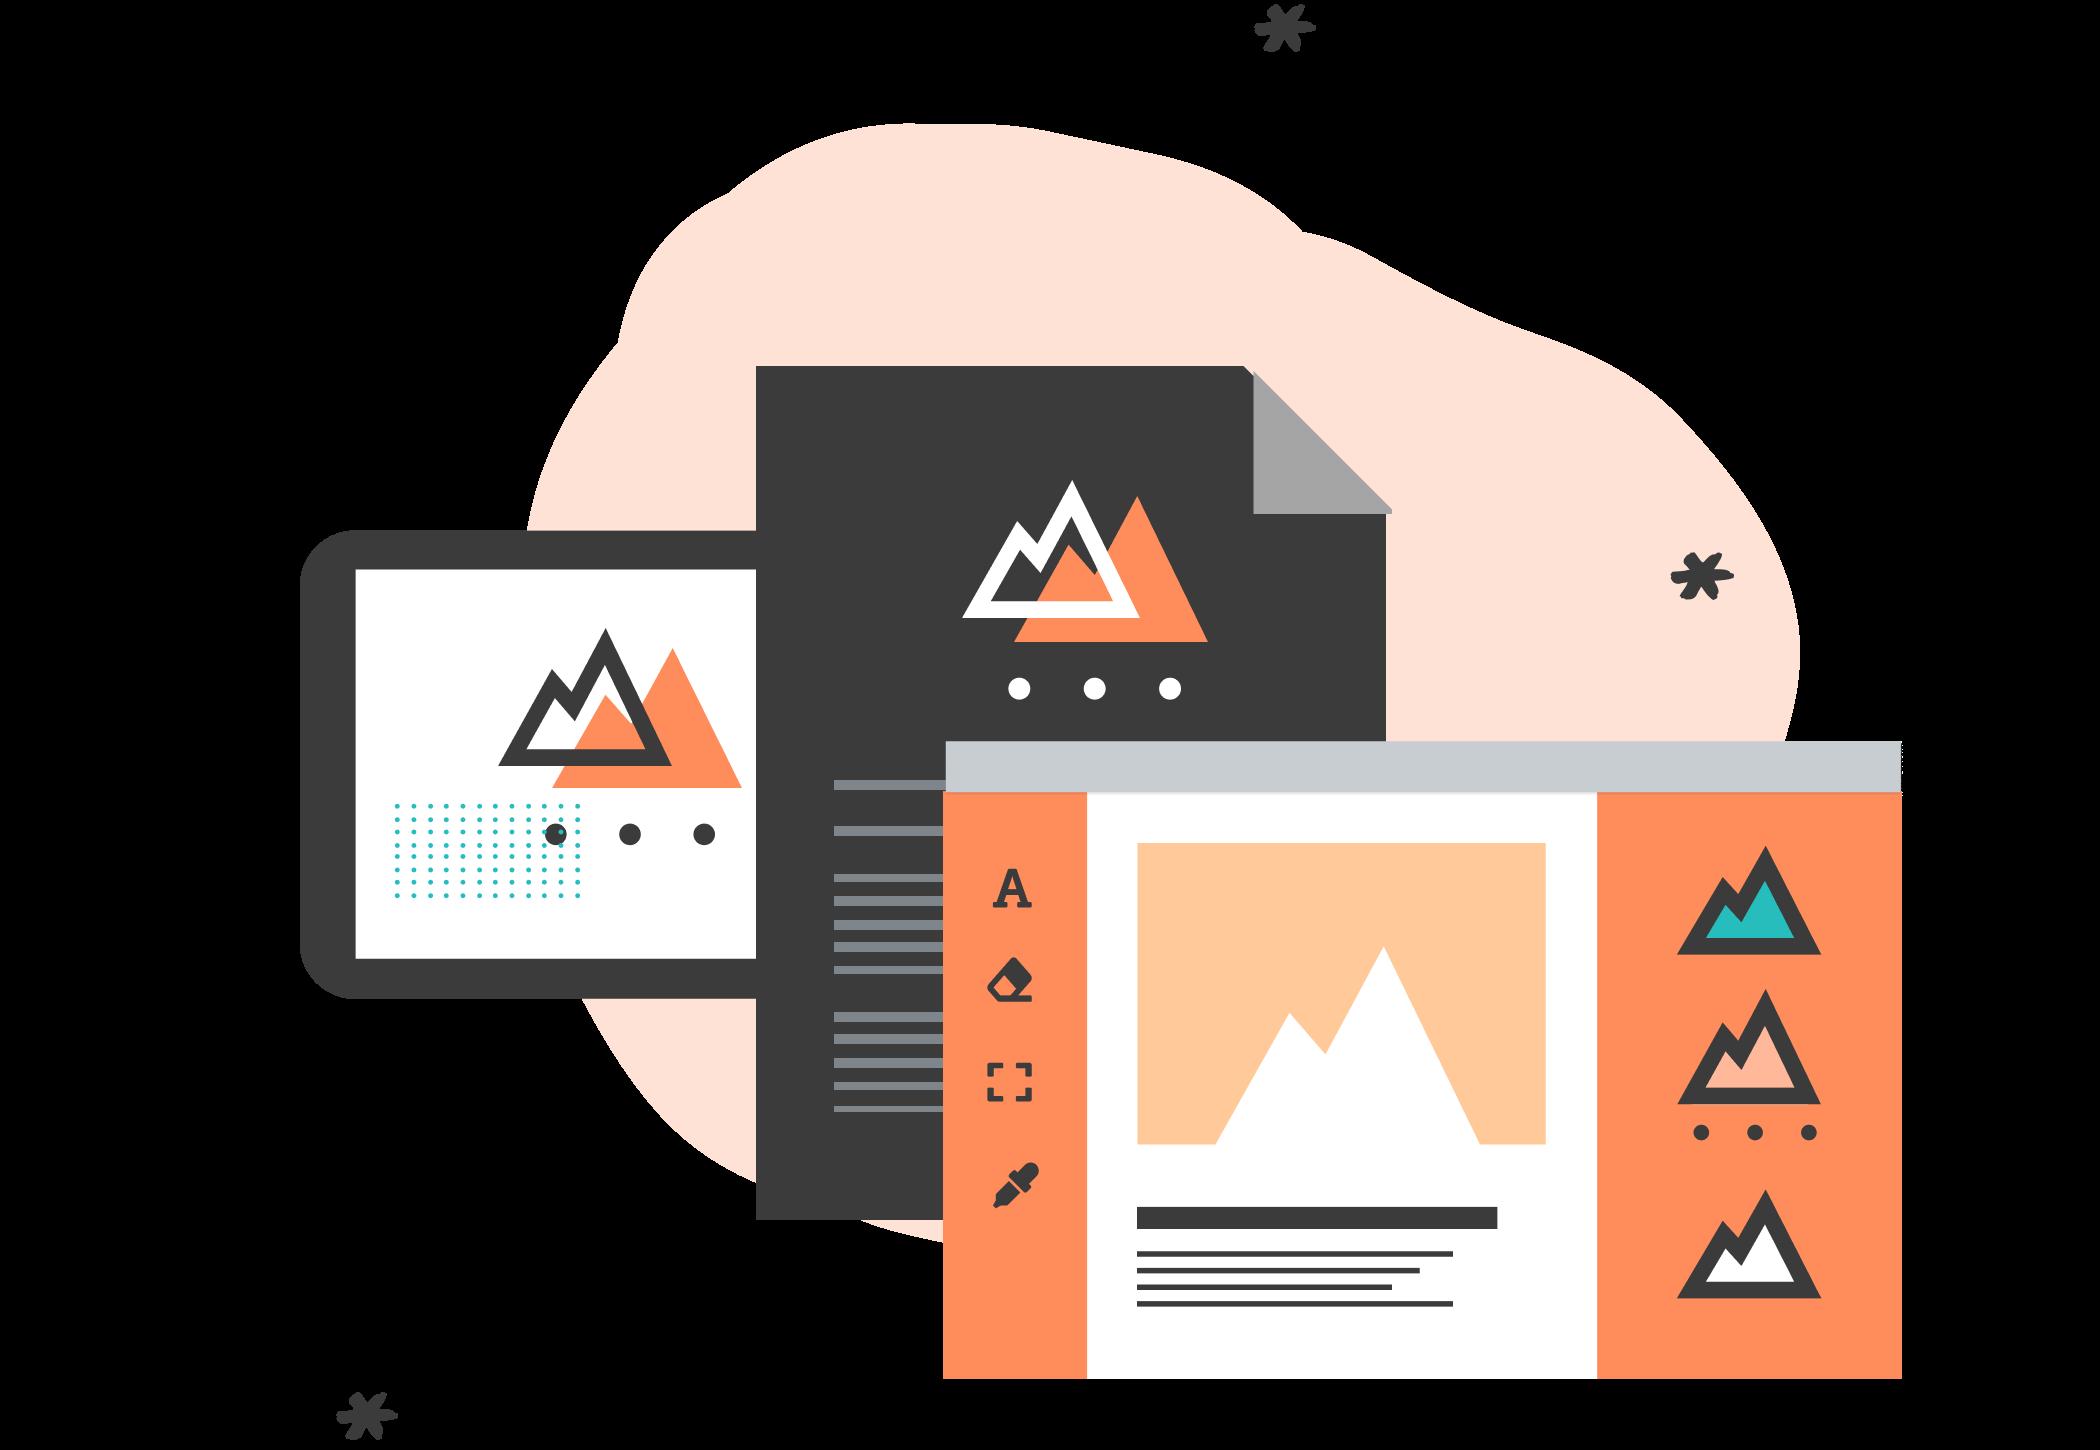 Visual Design Fundamentals and Tools Icon